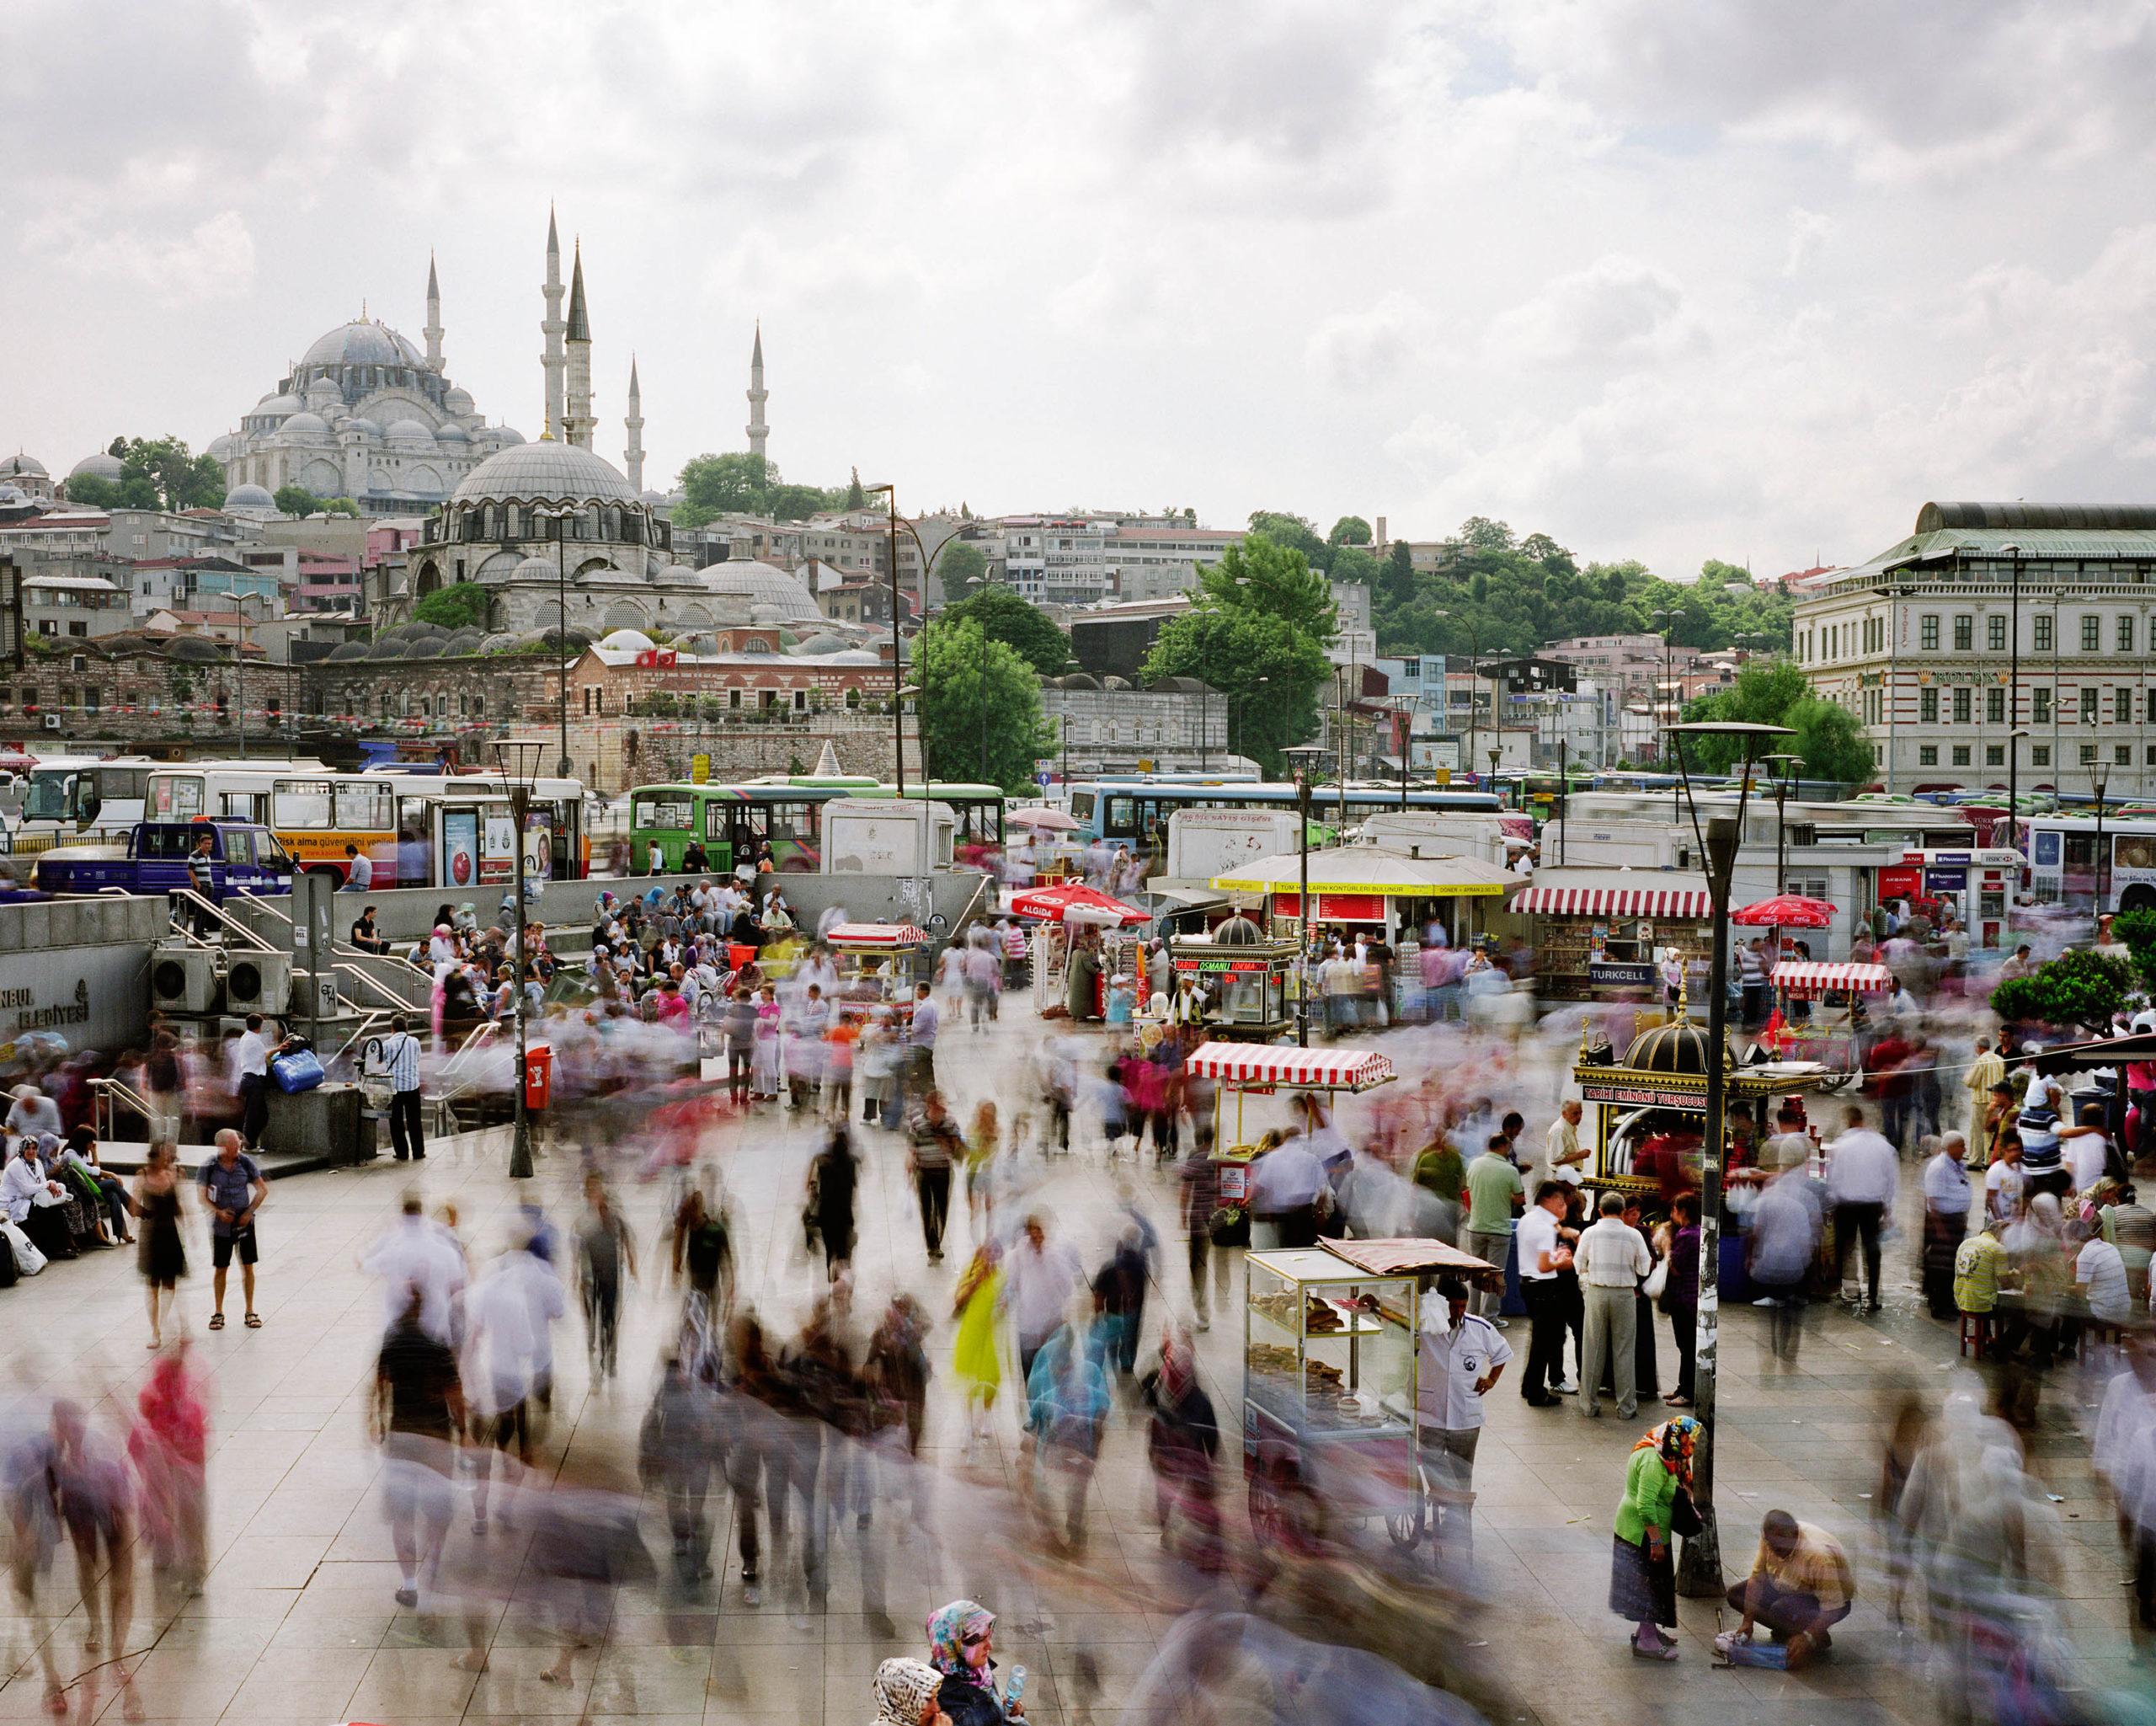 Eminonu Meydani, Fatih, Istanbul, Turkey